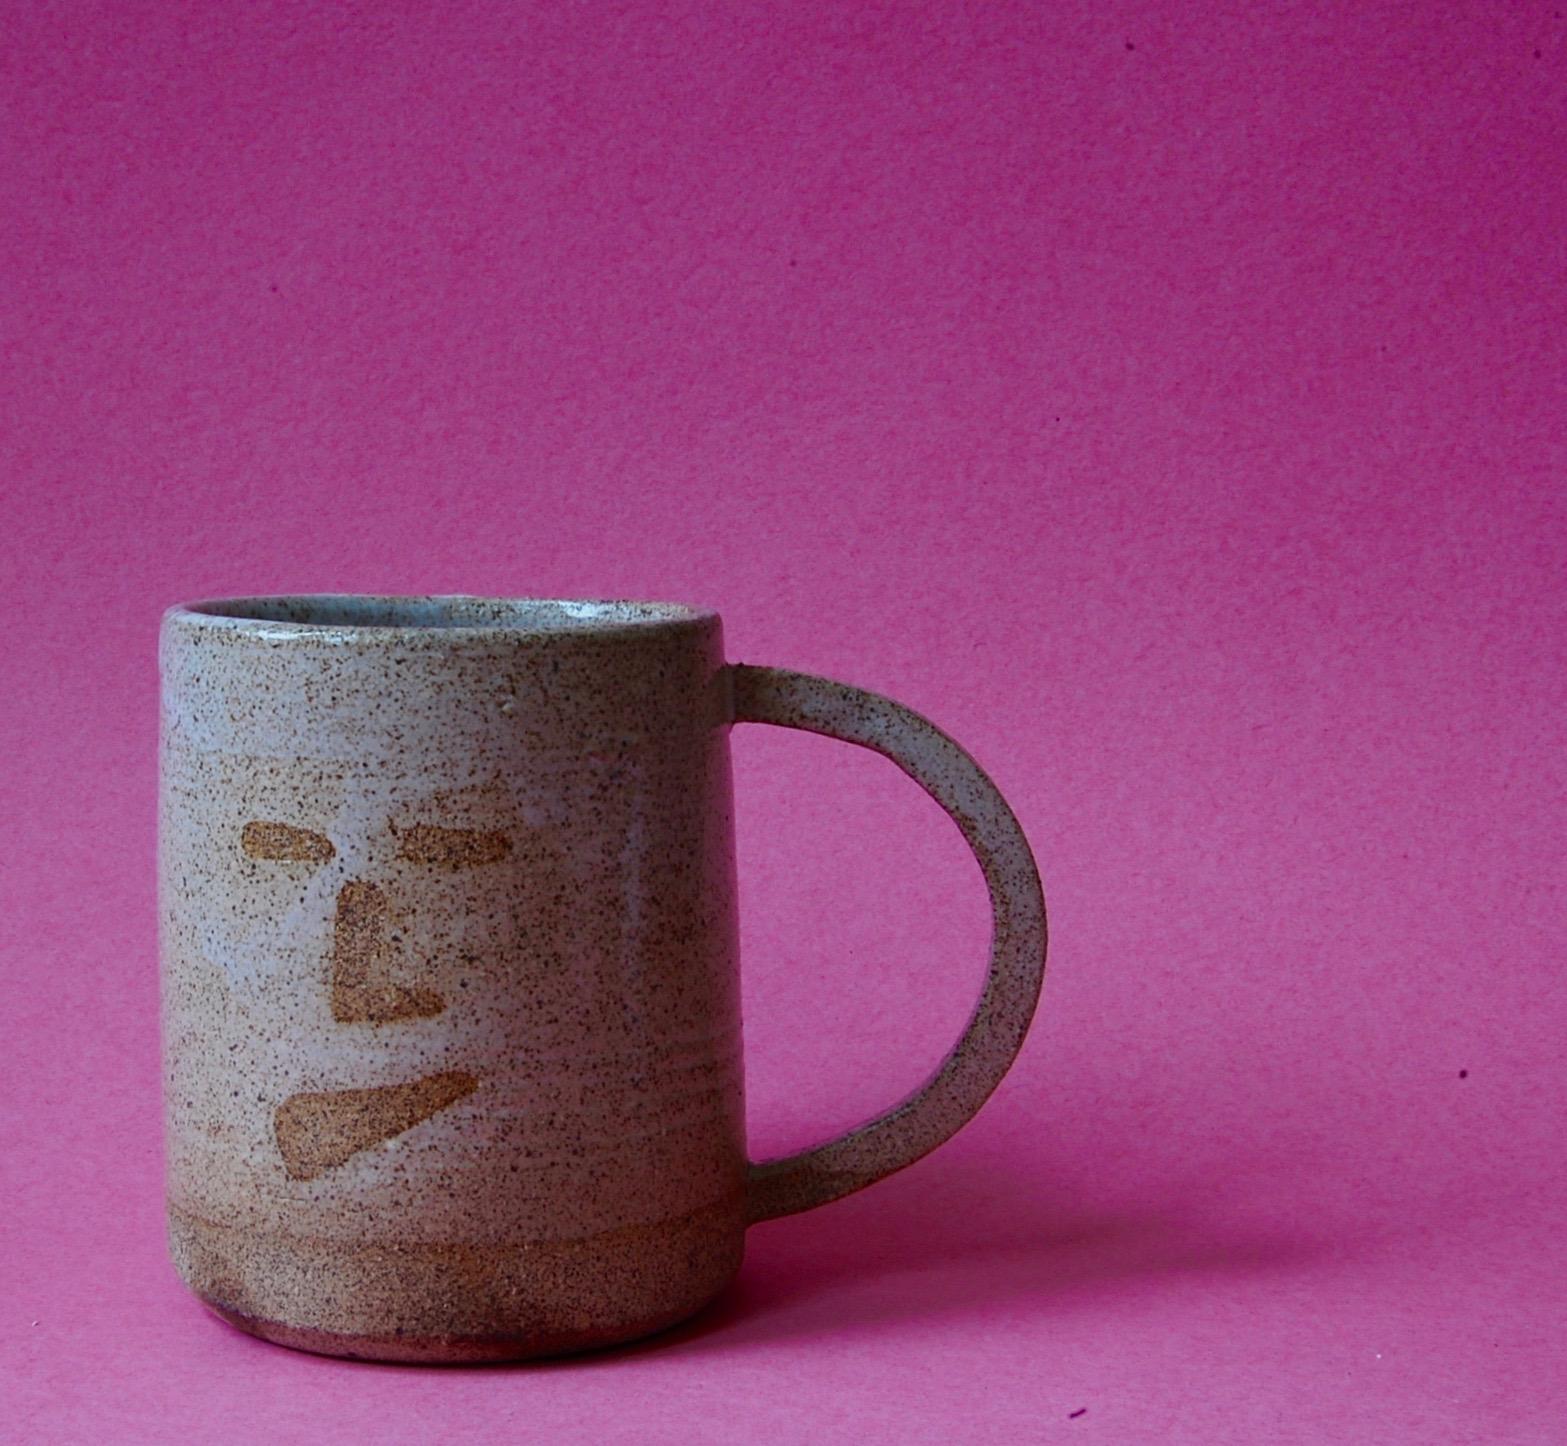 speckled face mug 1.jpg